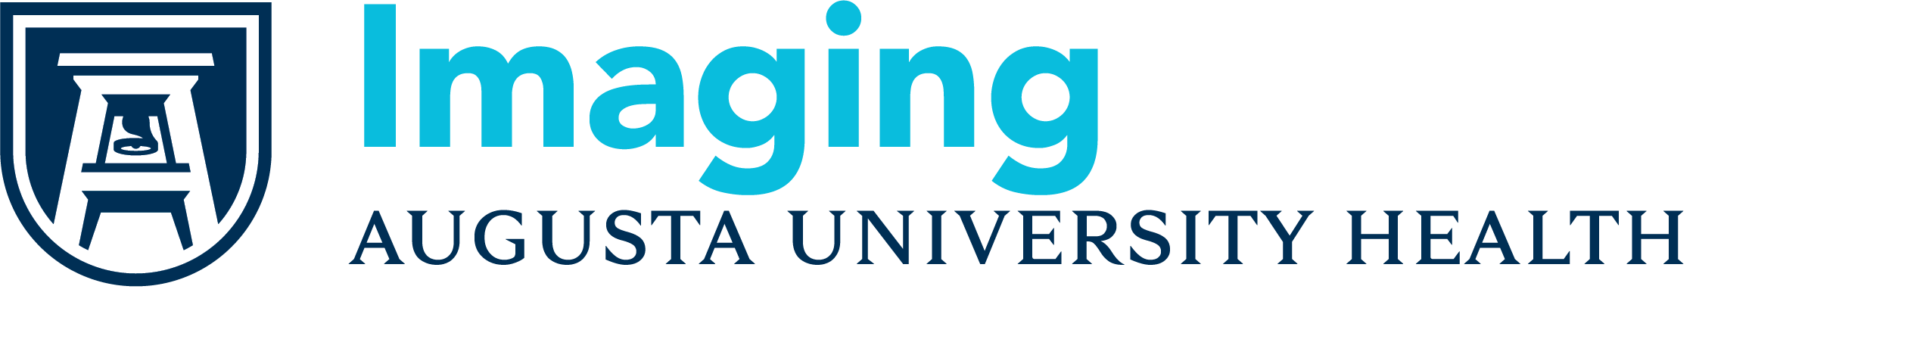 Imaging Augusta University Health of IDTF Management and Diagnostic Center Development